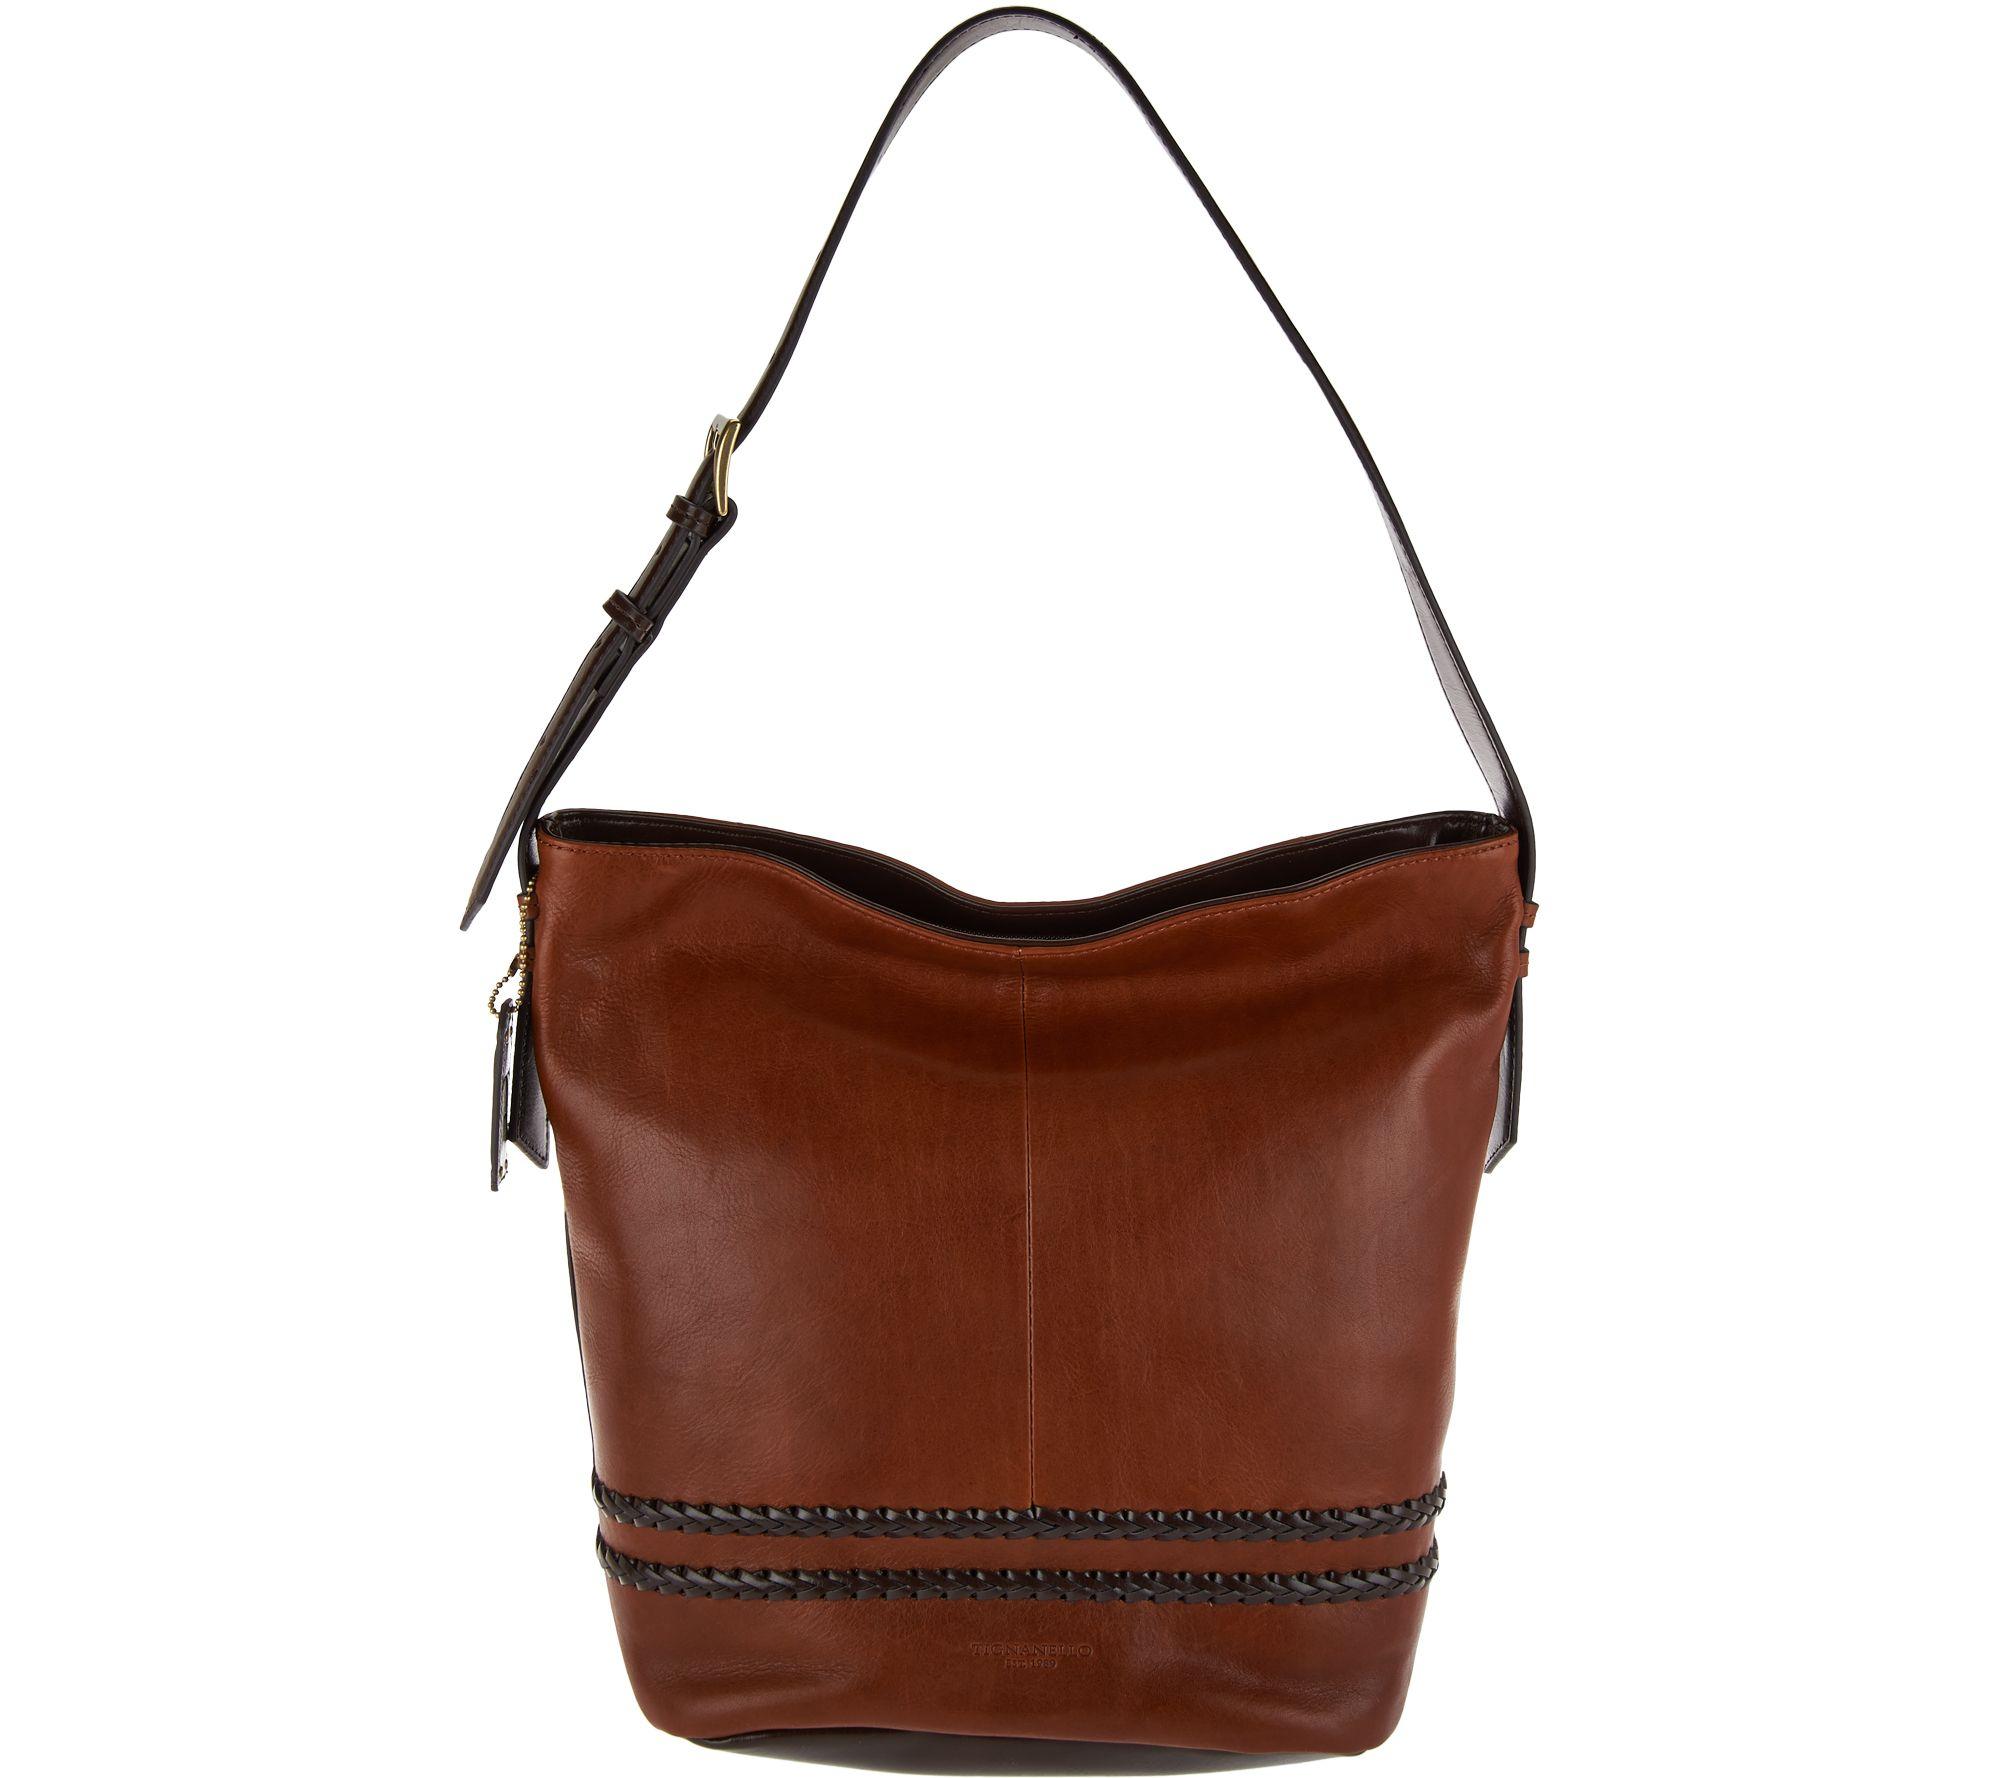 Tignanello Vintage Leather RFID Bucket Hobo Bag - Page 1 — QVC.com